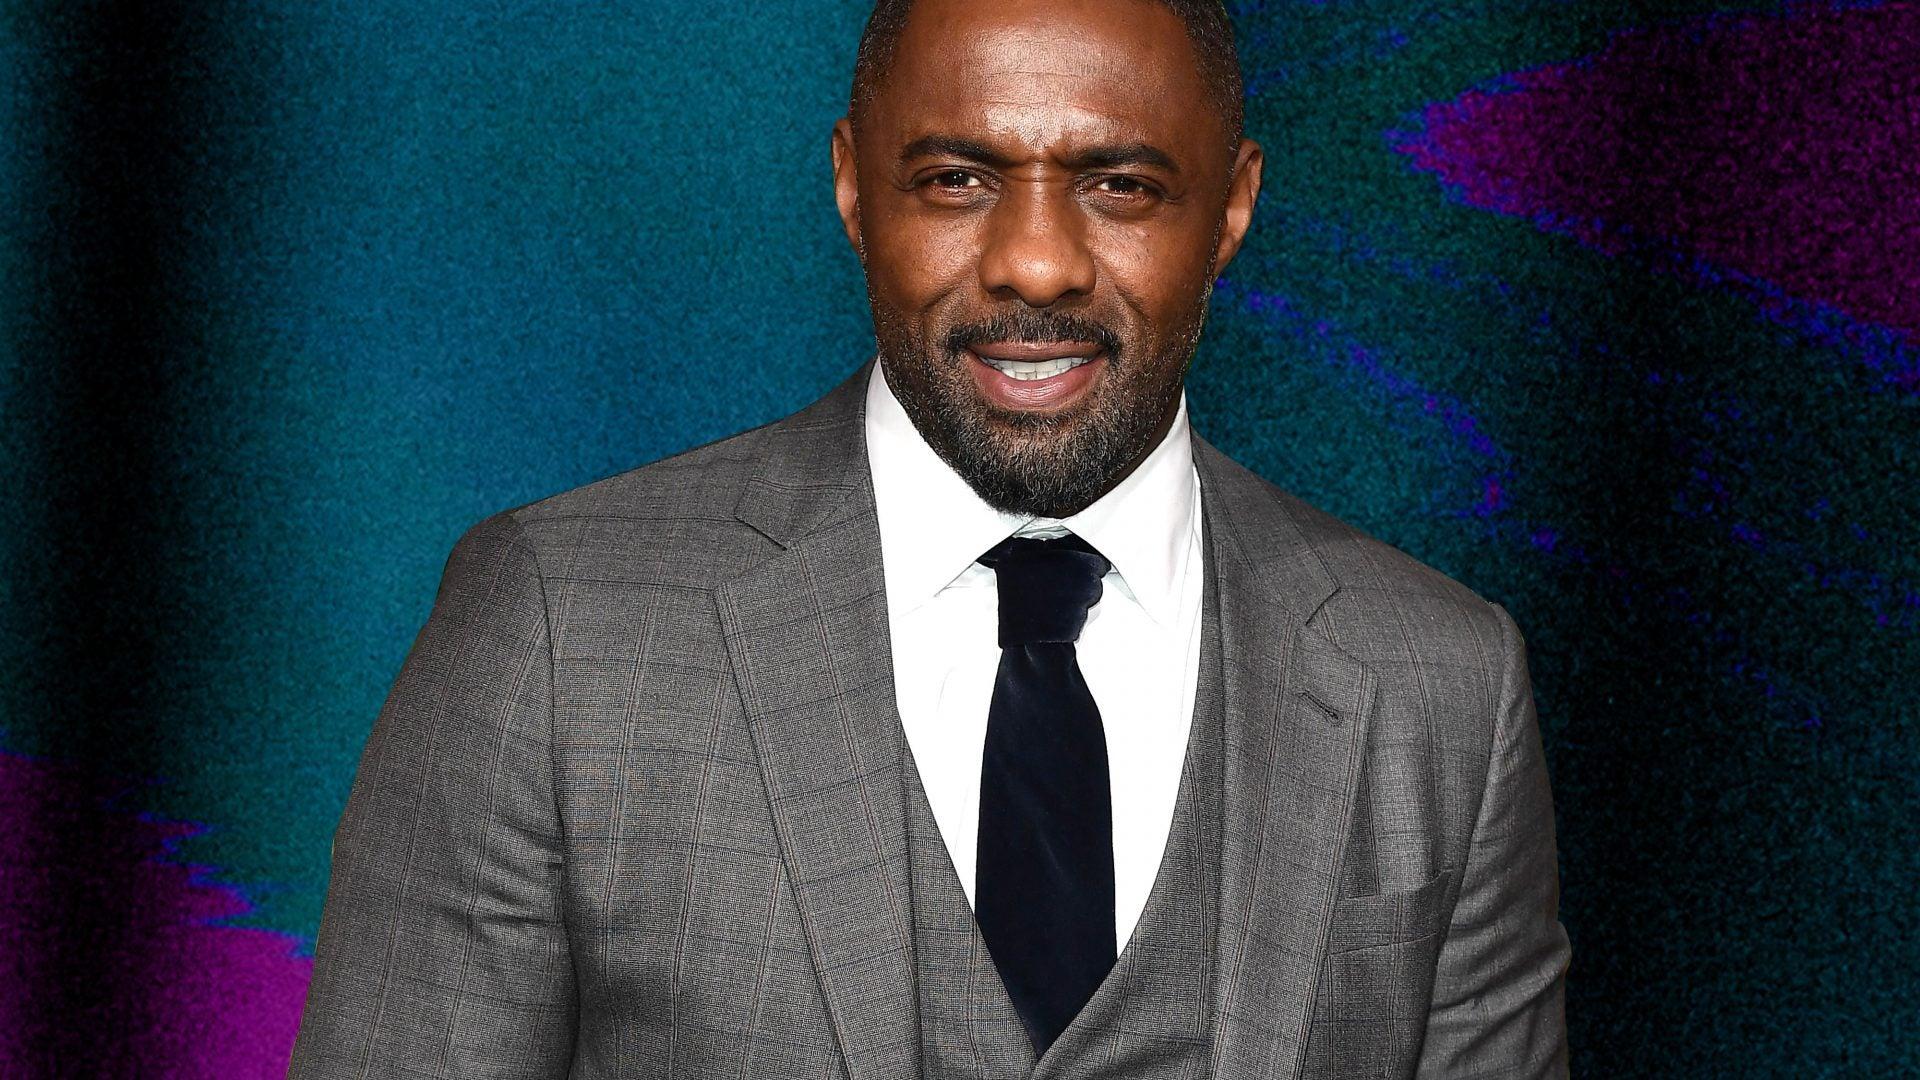 Idris Elba Says He's Taking A Break From Social Media